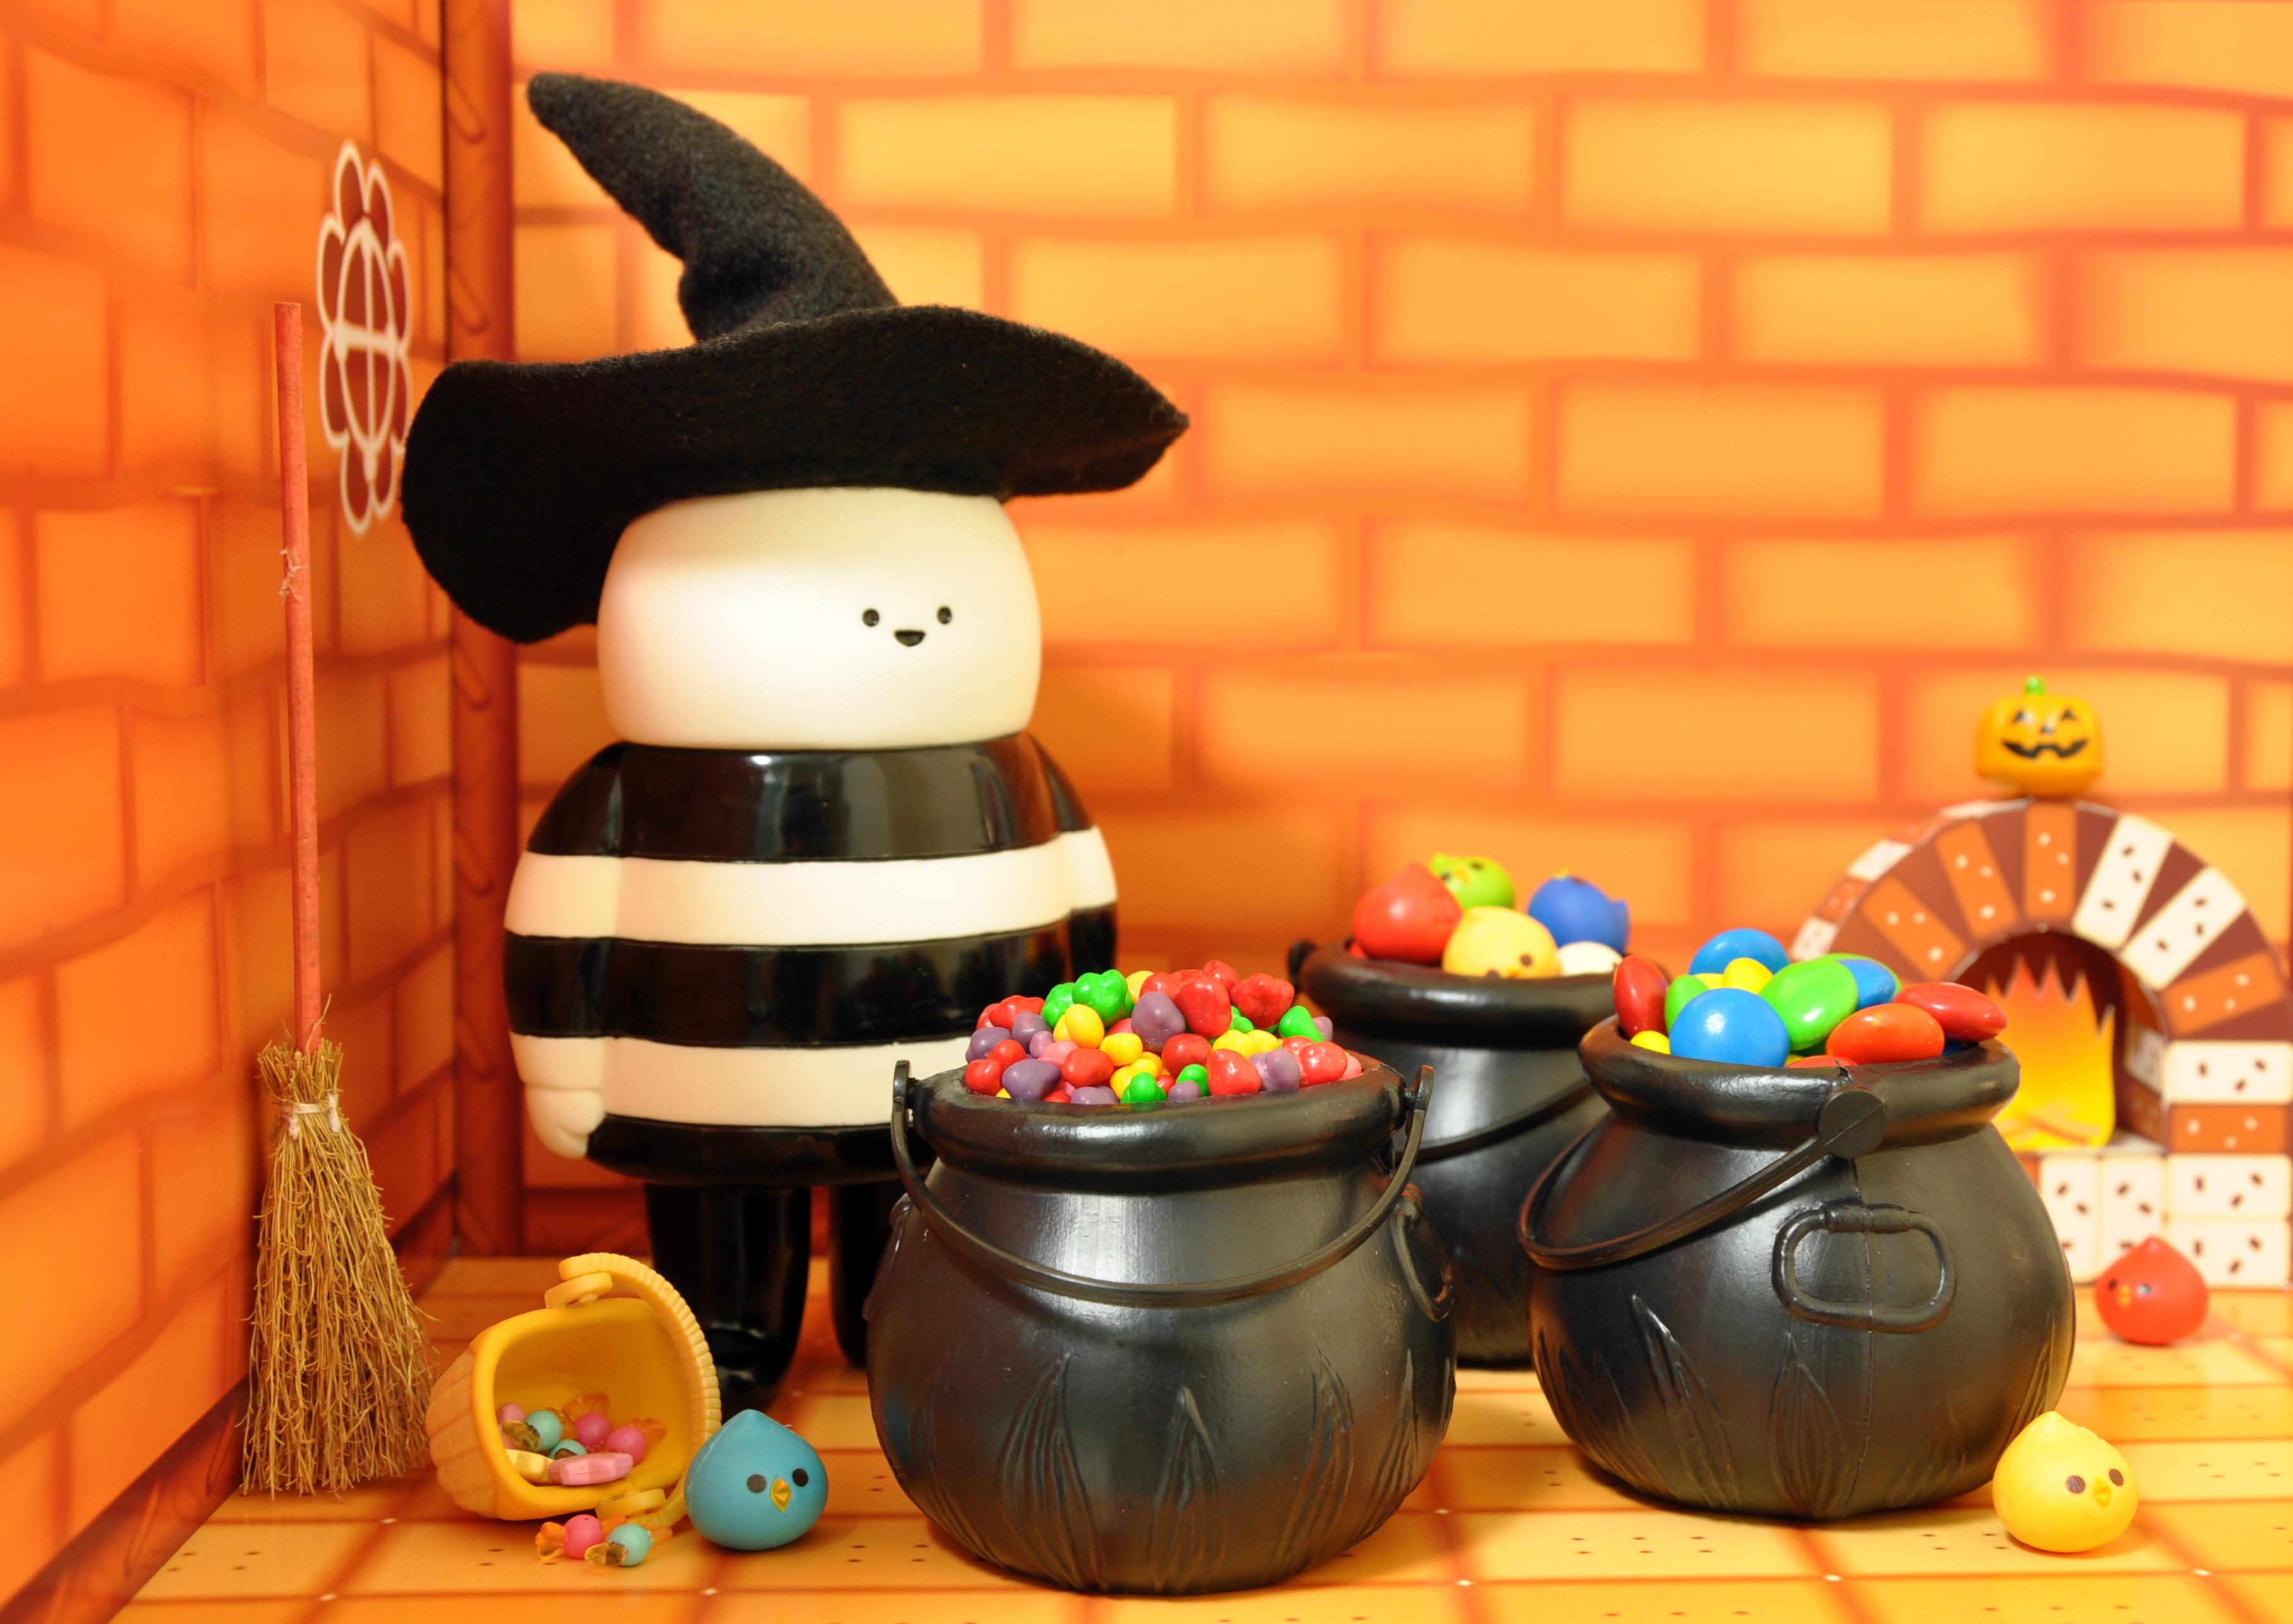 Dulces para Halloween - 3626x2568